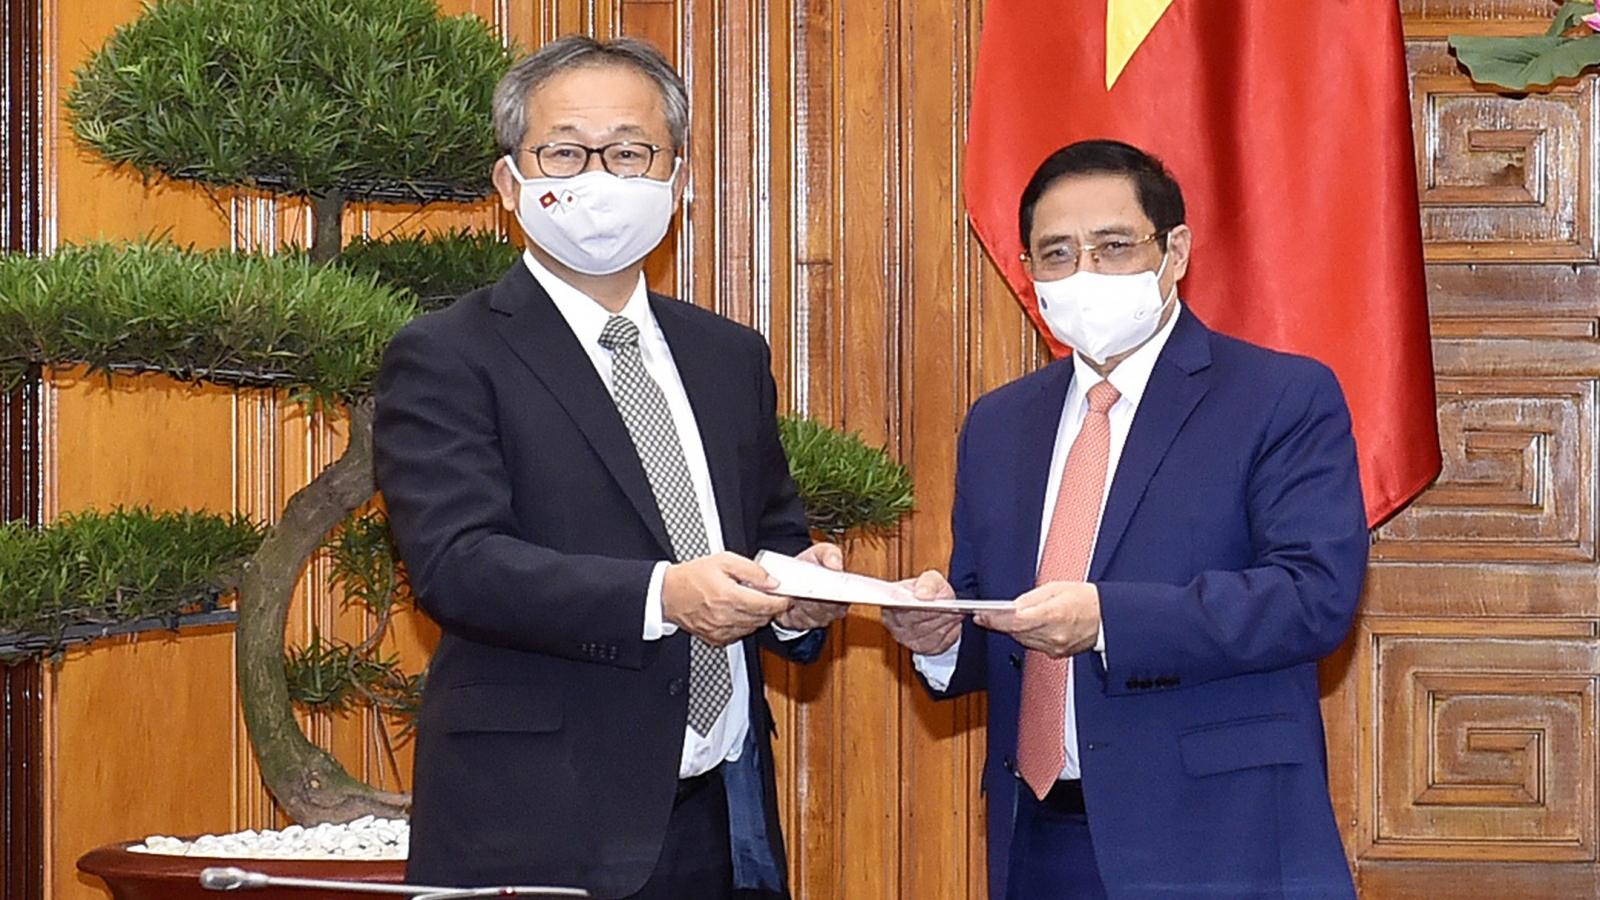 Japan grants Vietnam 1 million doses of COVID-19 vaccine